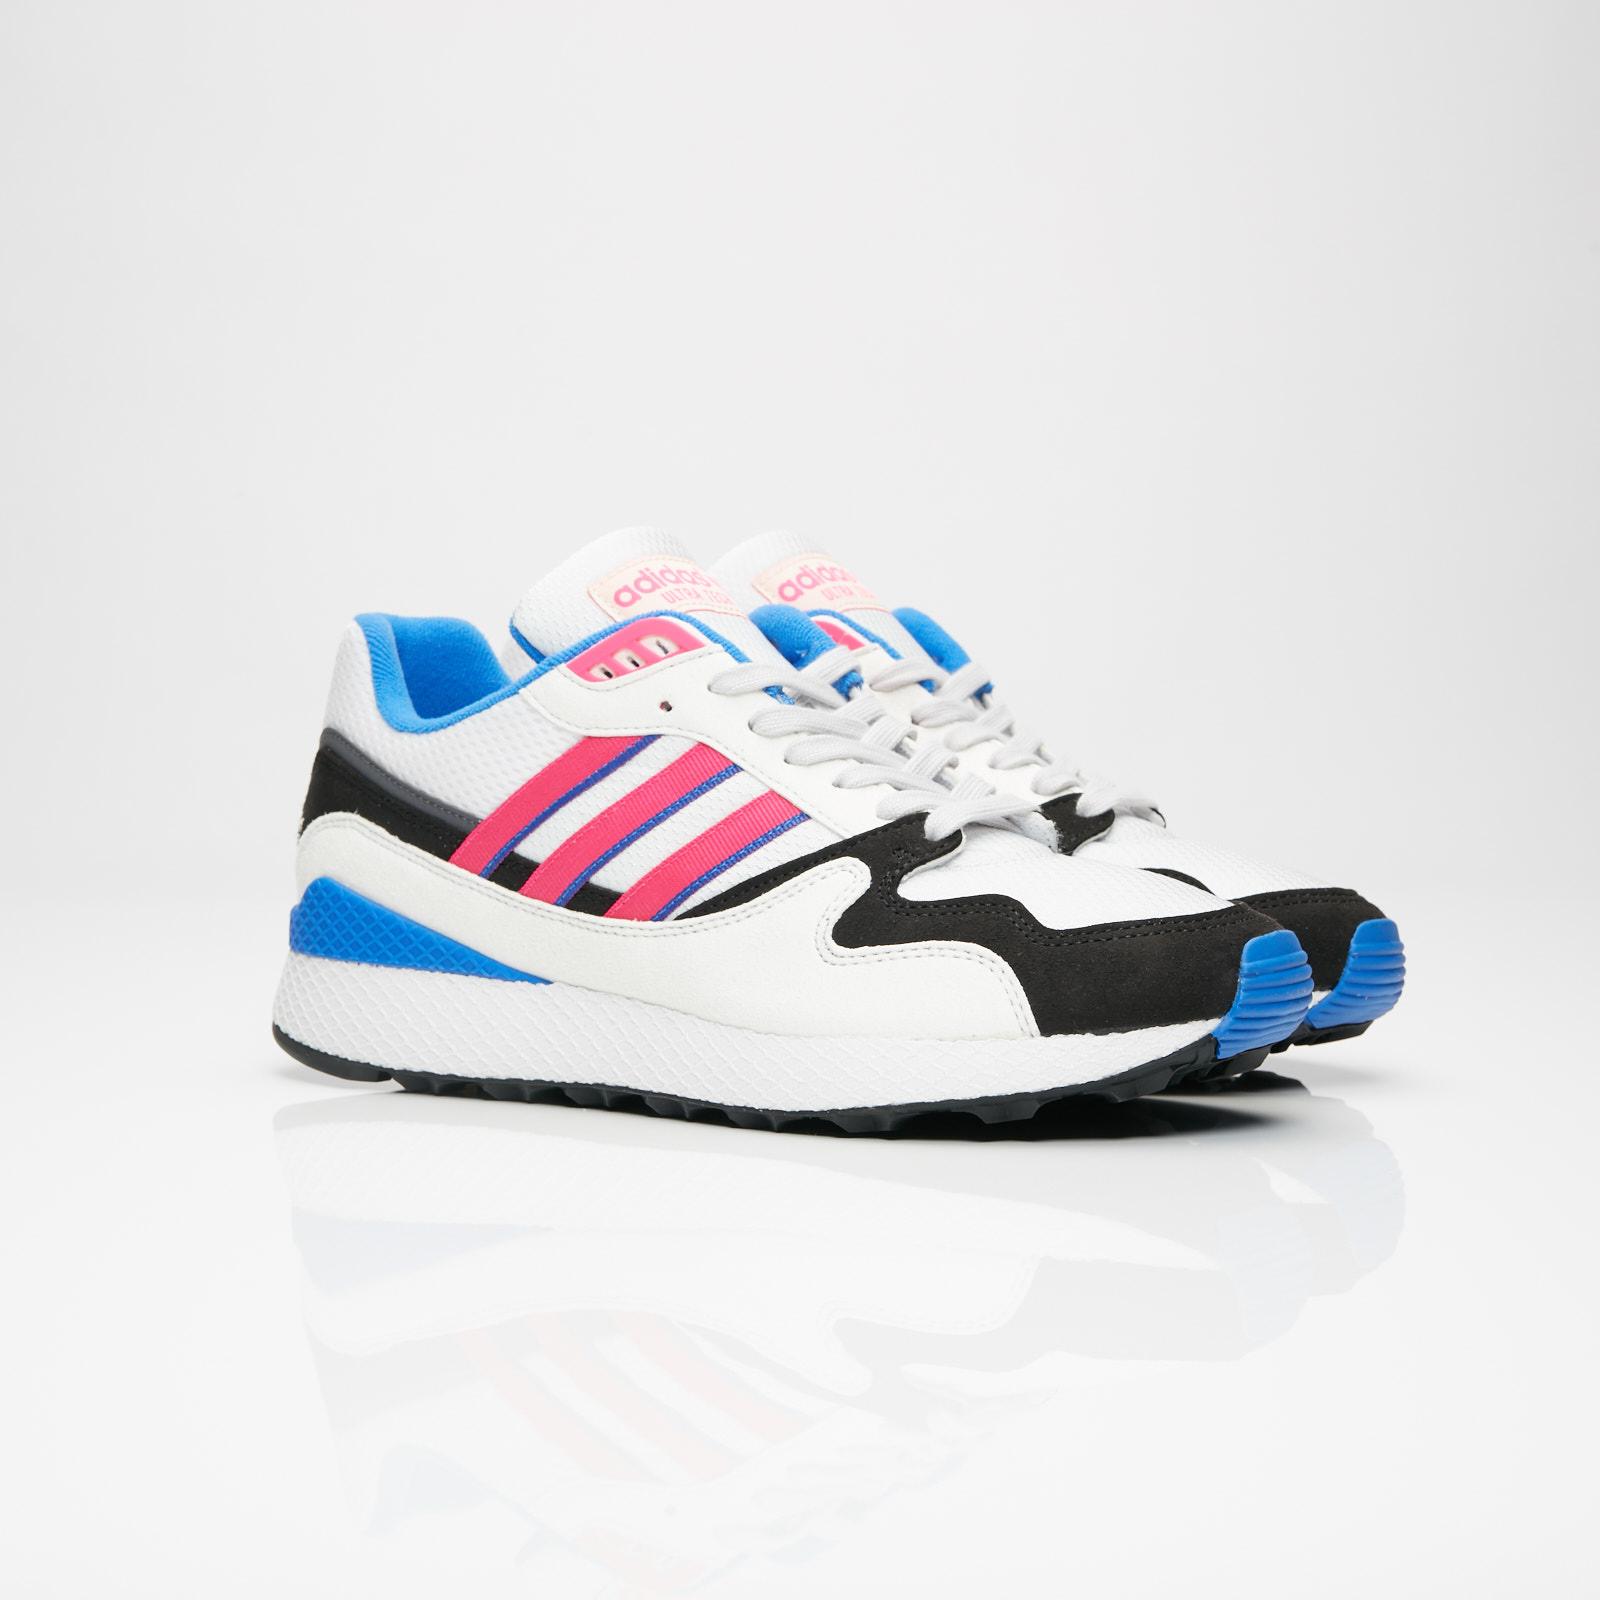 Baskets homme adidas Originals Ultra Tech AQ1190 TaW4IUS